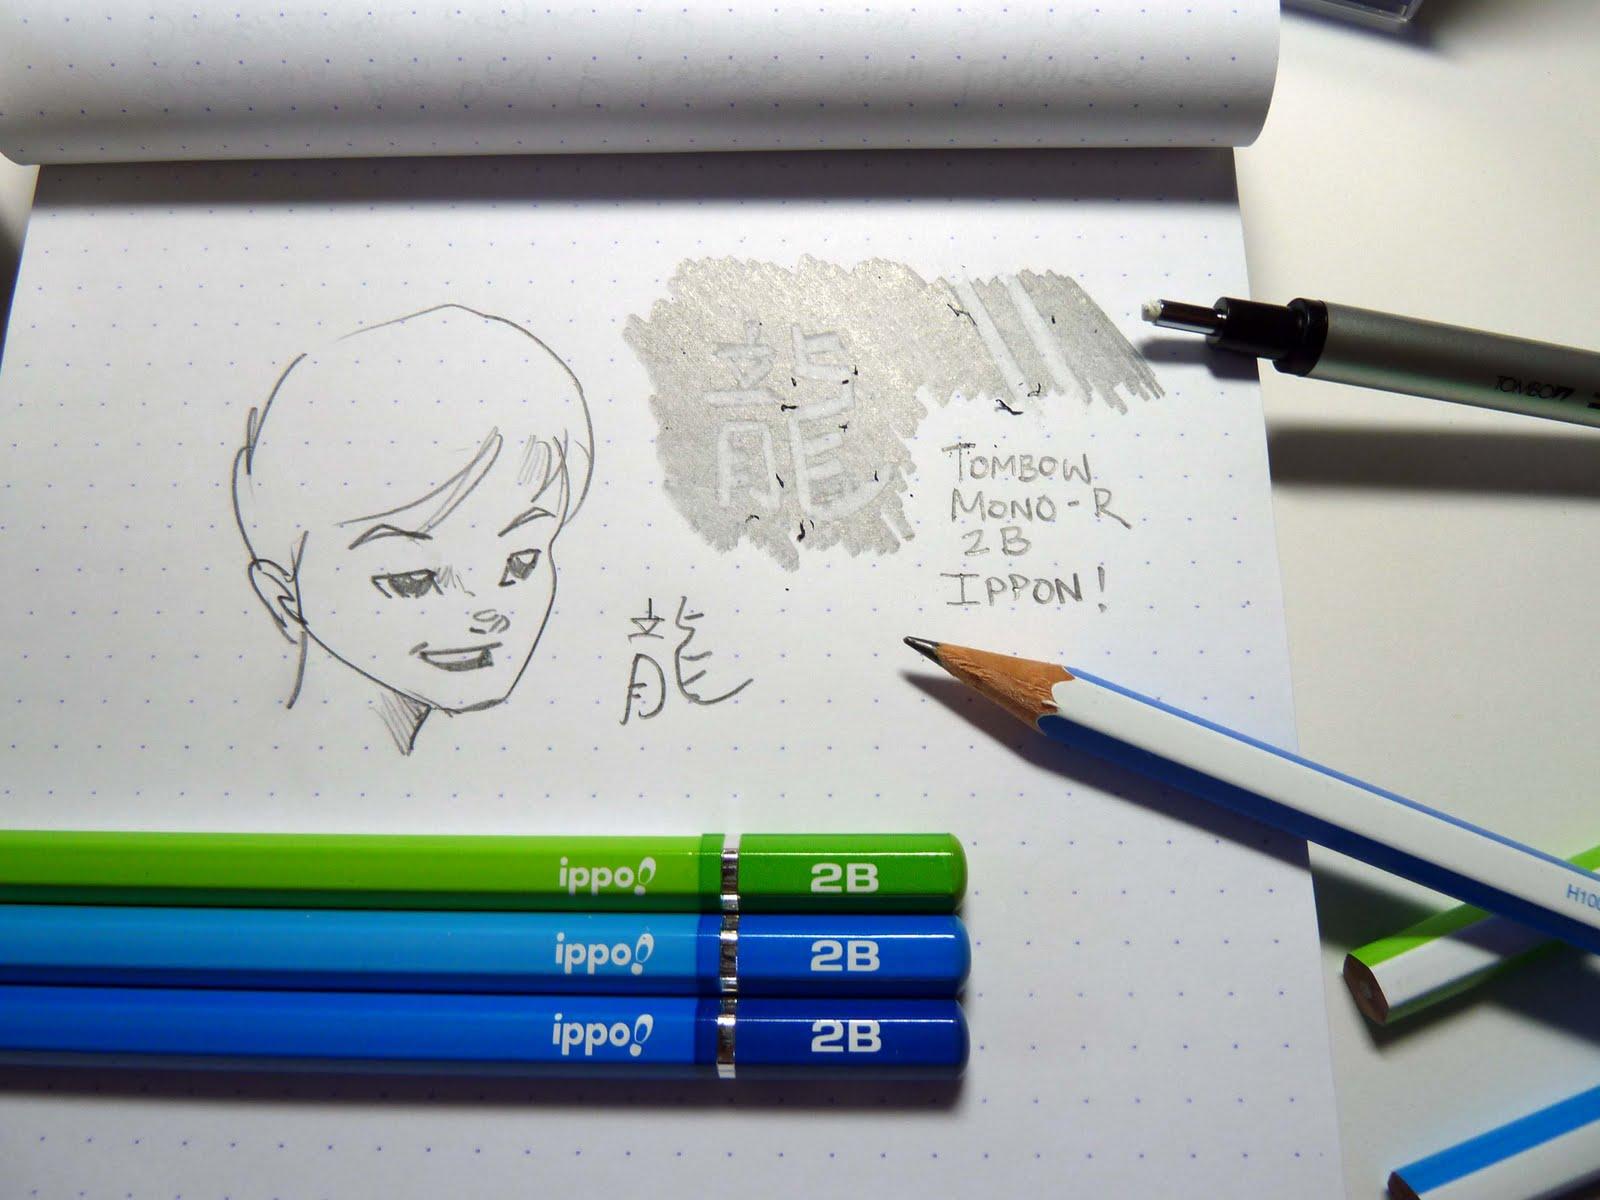 Tombow mono r ippo pencils and tombow mono zero 2 3 mm precision eraser initial impression